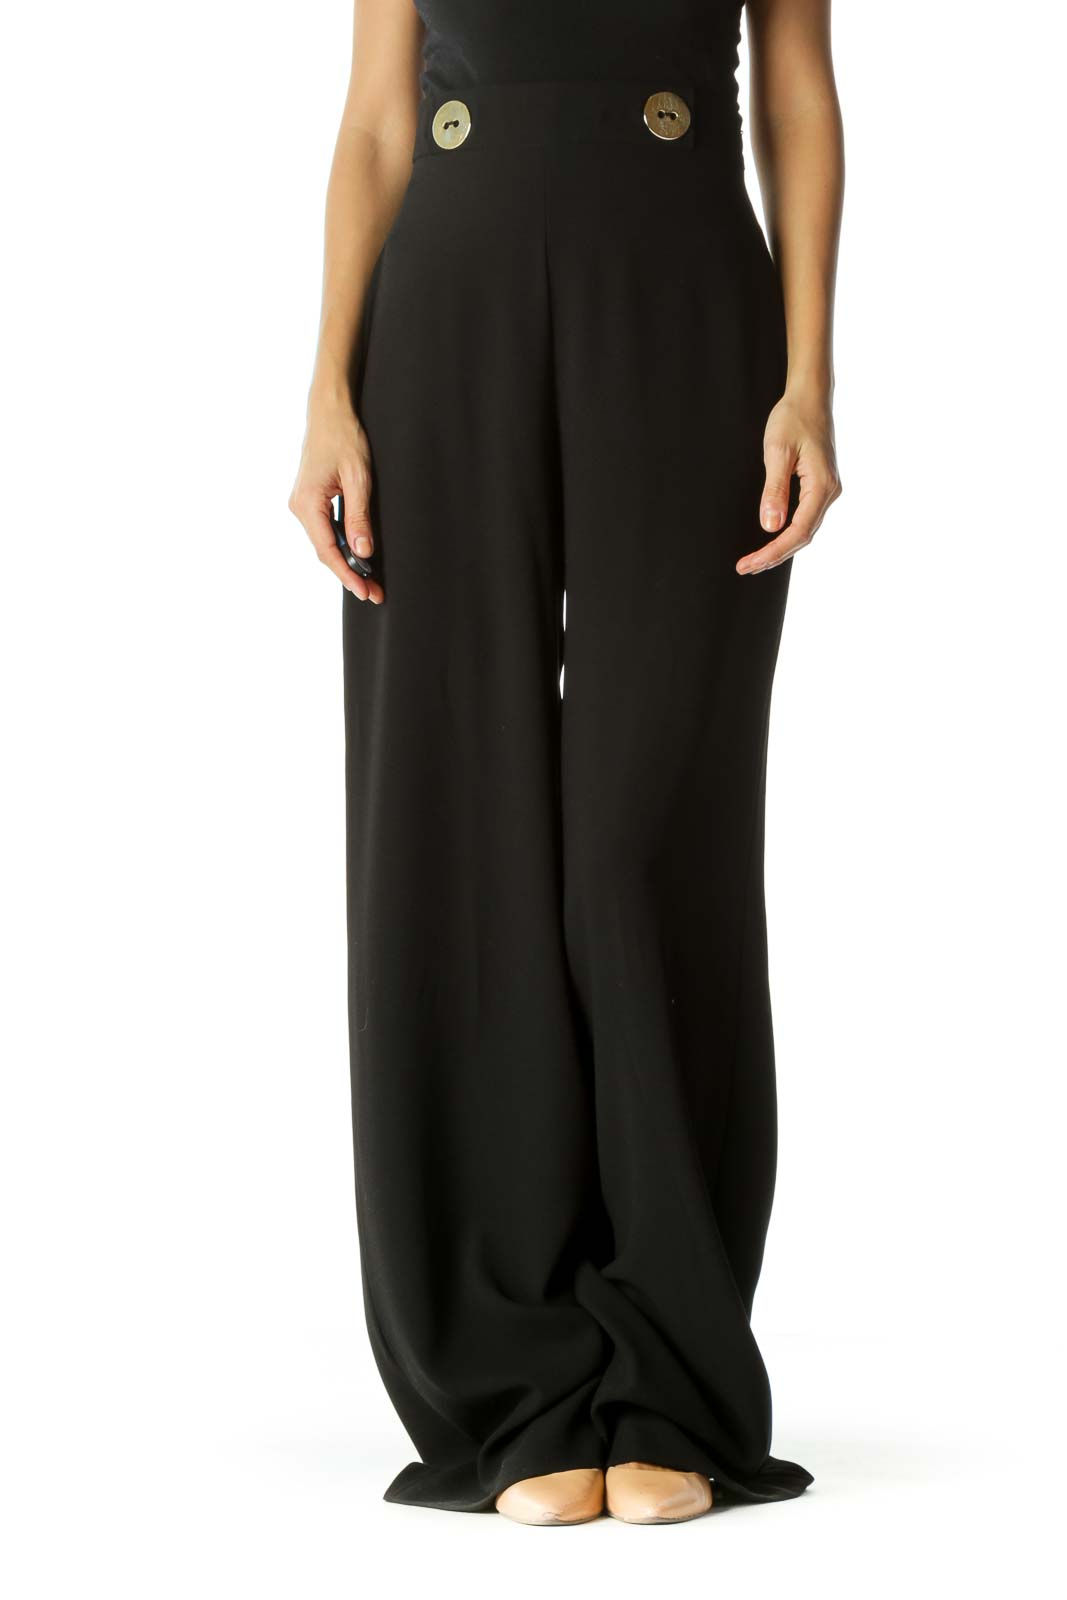 Black Gold Button Accents Wide-Leg Draped Pants Front